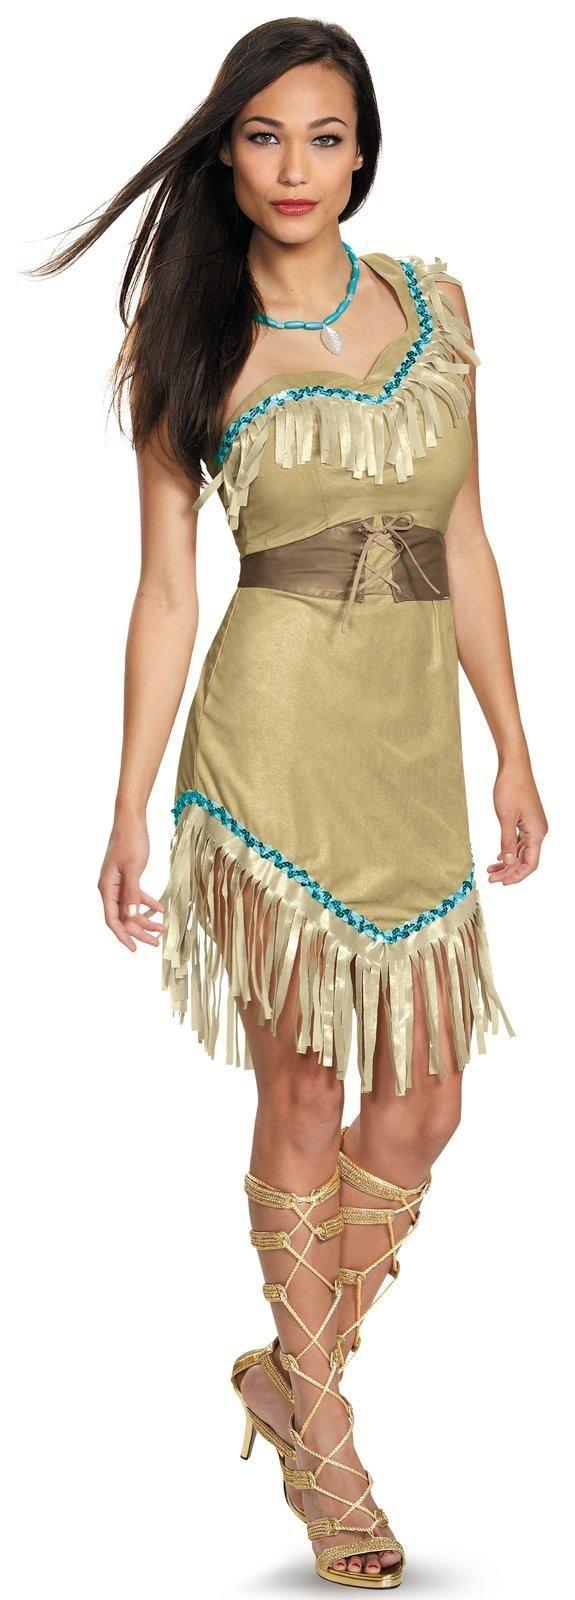 disney princess deluxe womens pocahontas costume - Disney Princess Halloween Costumes Diy